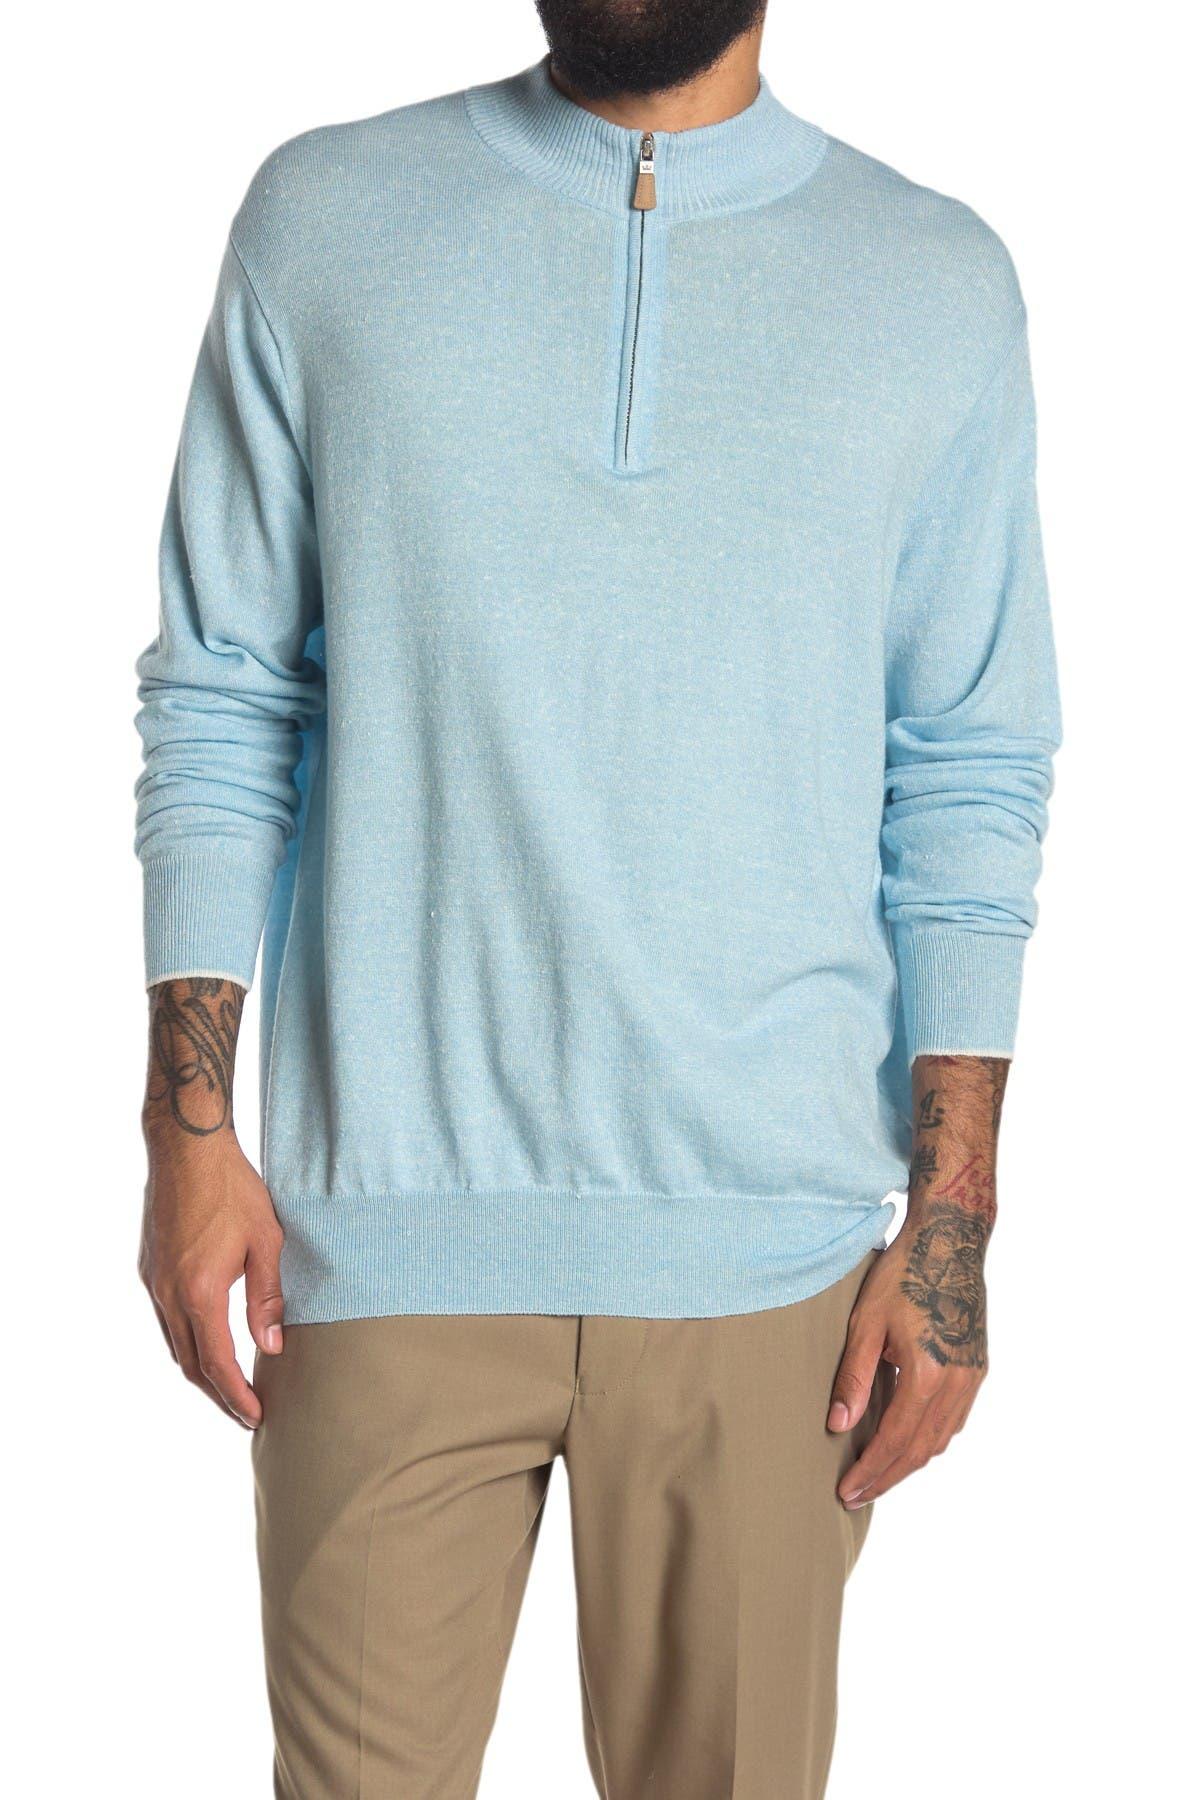 Image of Peter Millar Crown Quarter Zip Pullover Sweater